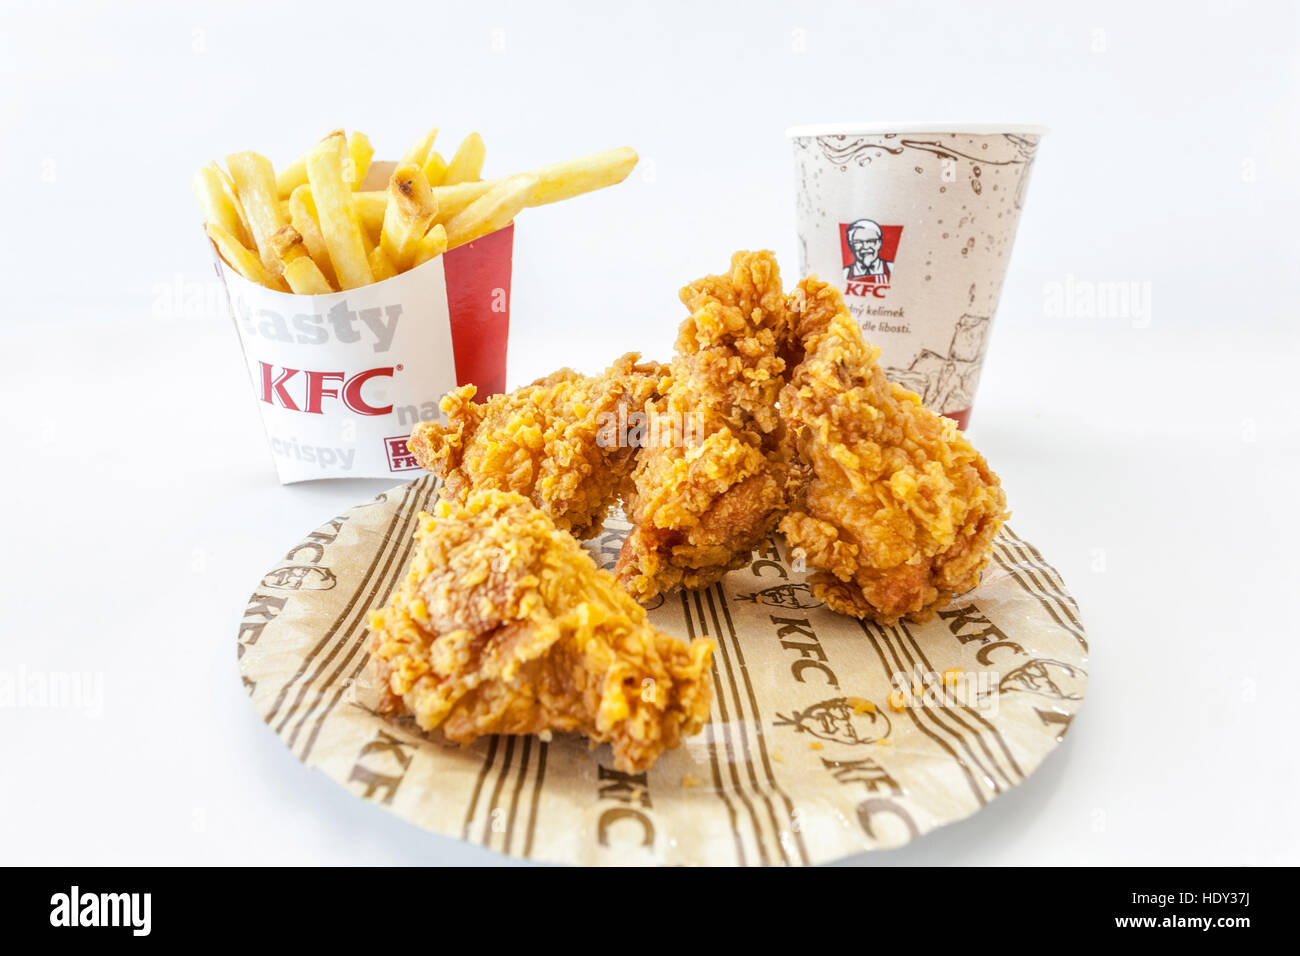 KFC Kentucky Fried Chicken, comida caliente, menú de alas Imagen De Stock